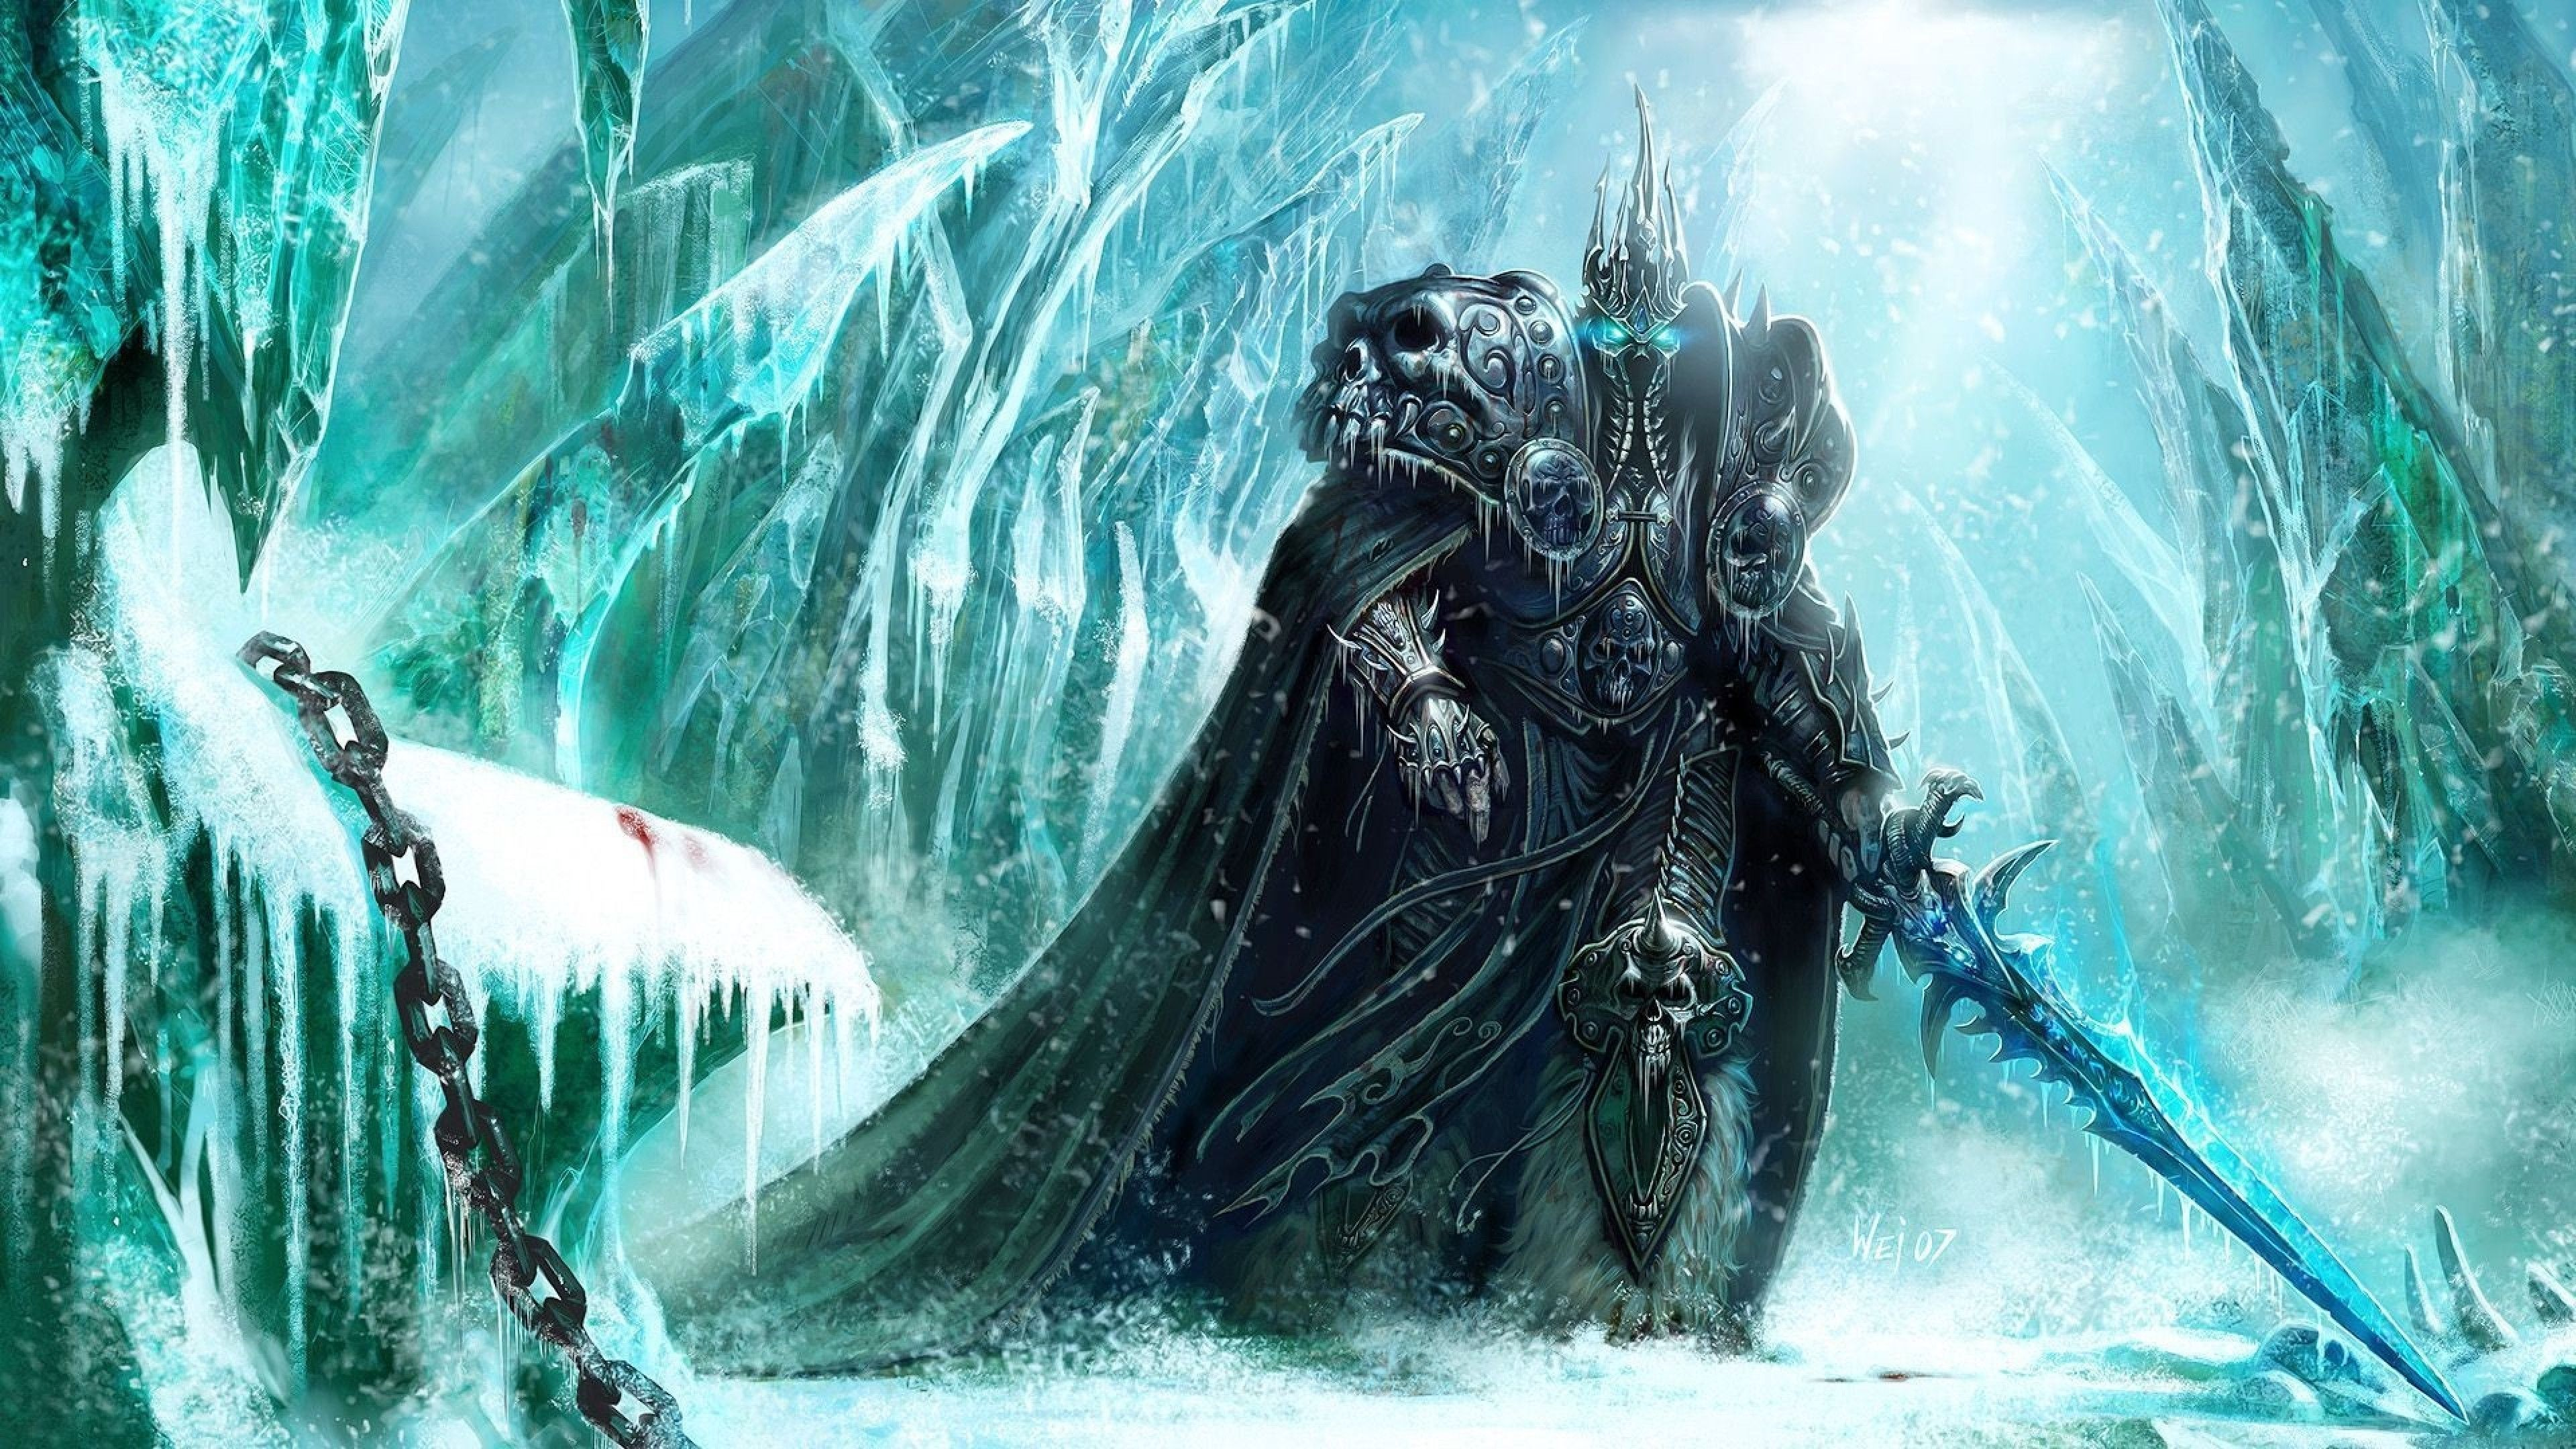 4k World Of Warcraft Wallpapers Top Free 4k World Of Warcraft